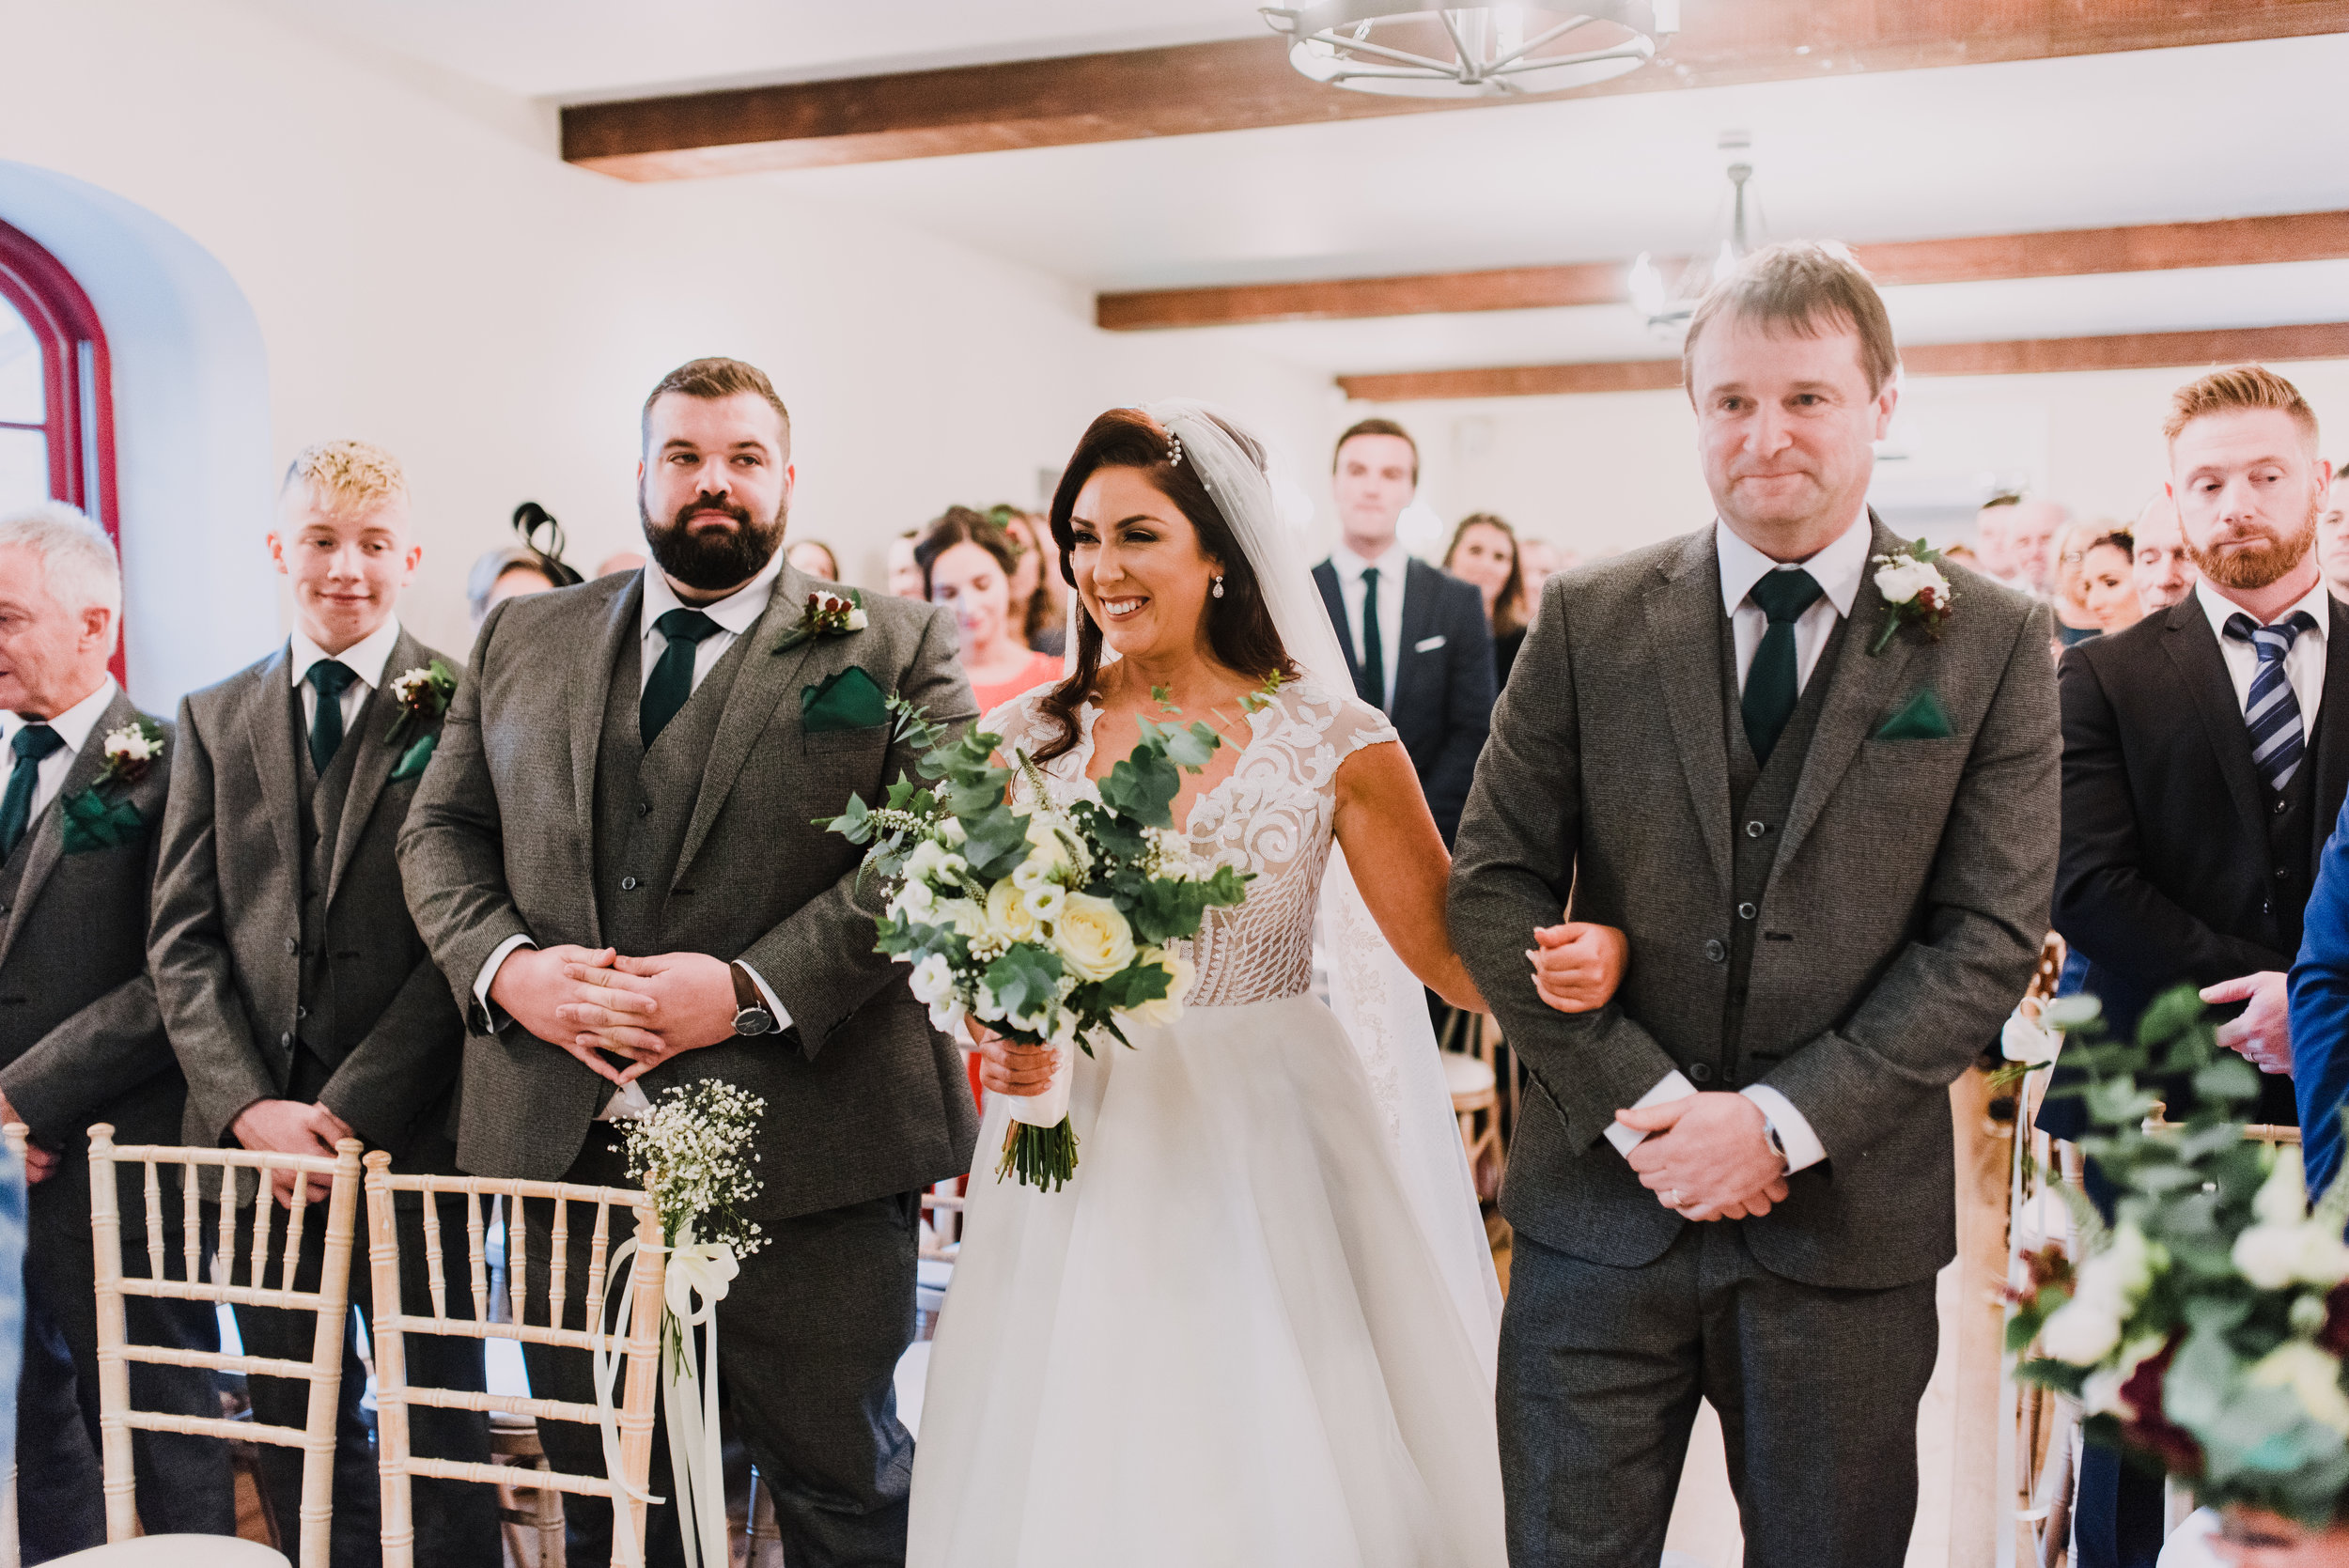 larchfield estate wedding, wedding venues northern ireland, barn wedding venues northern ireland, quirky weddings northern ireland, 5 star wedding venues ni, wedding ceremony larchfield estate  (4).jpg